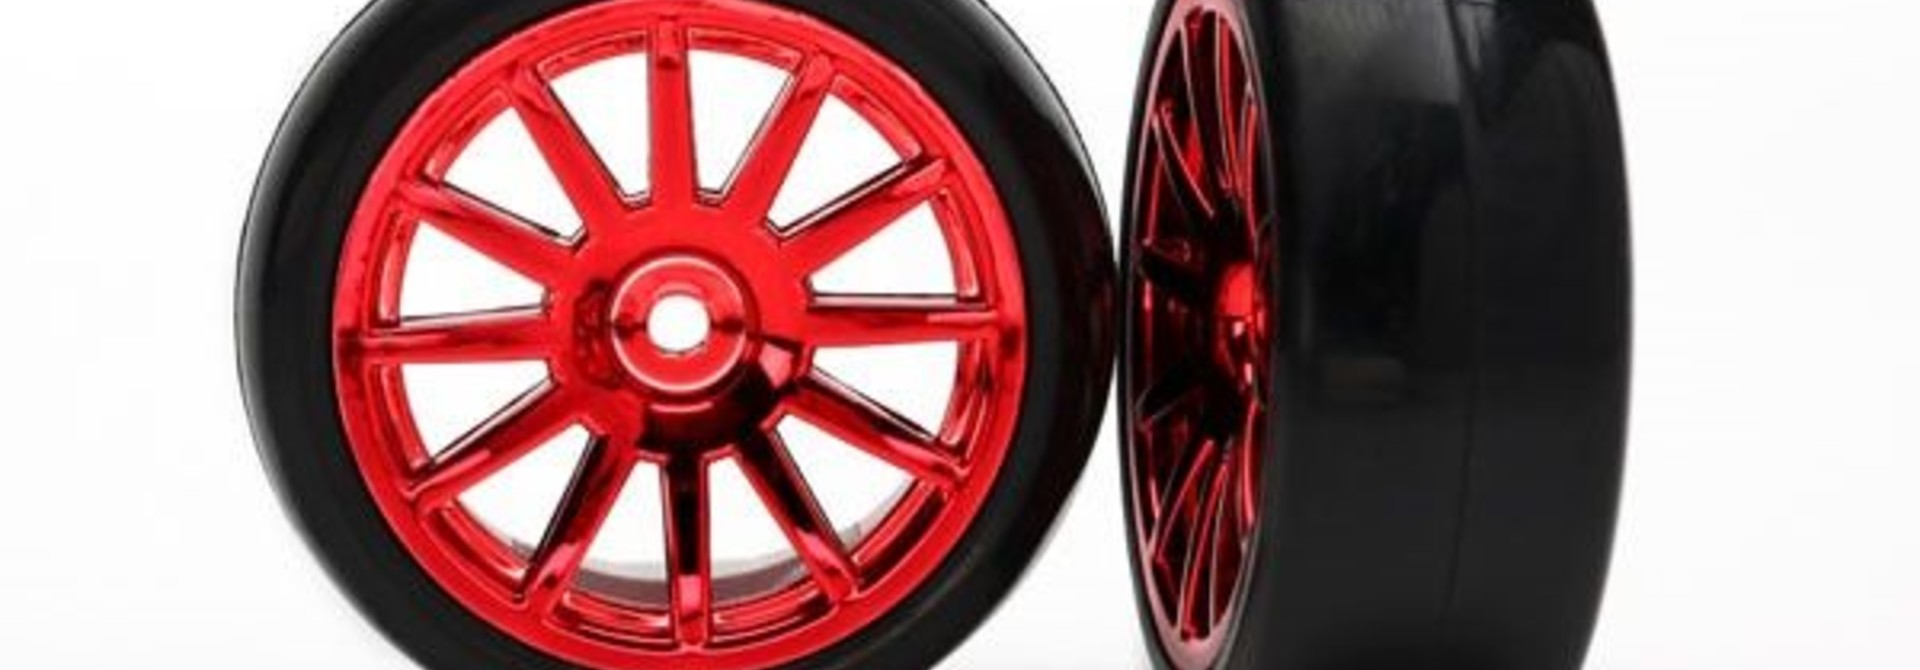 12-Sp Red Wheels, Slick Tires Tires & Wh, TRX7573X